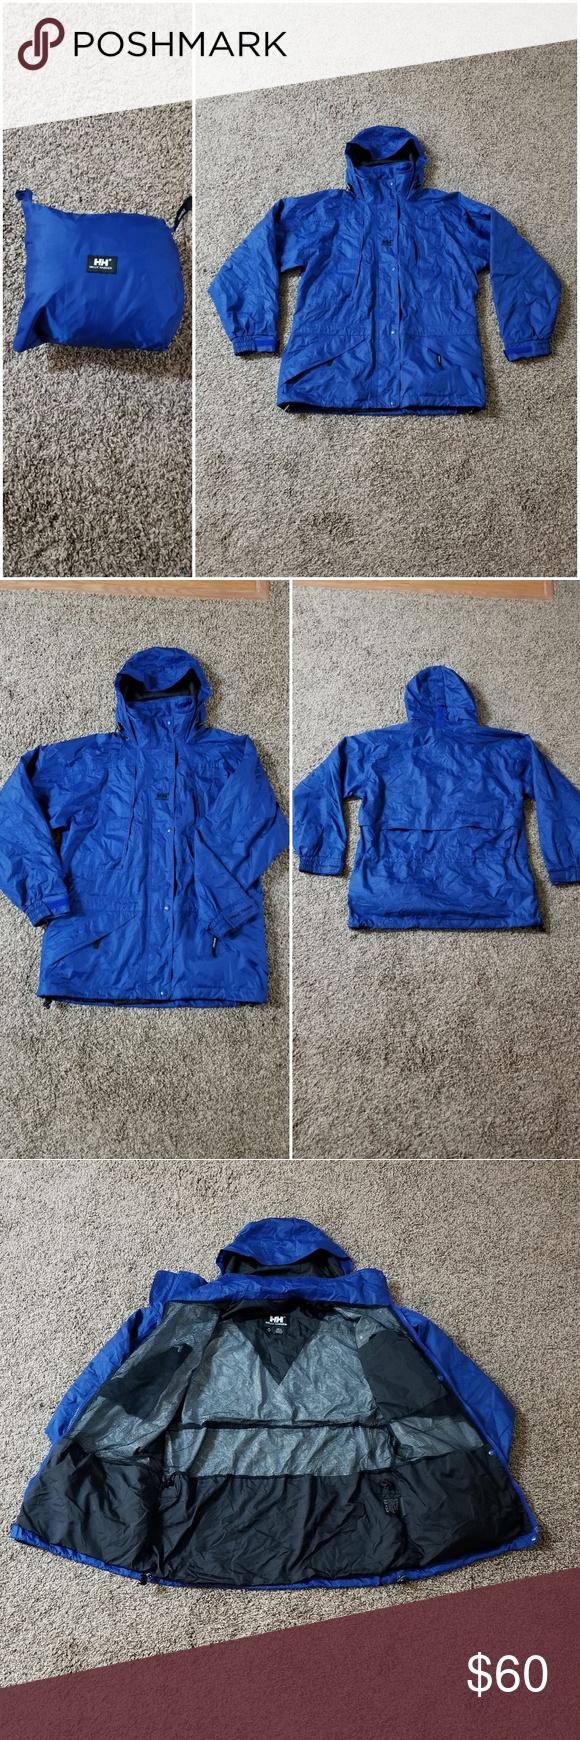 192d03b5f Helly Hansen packable rain jacket Helly Hansen packable rain jacket. Womens  size Medium. Royal